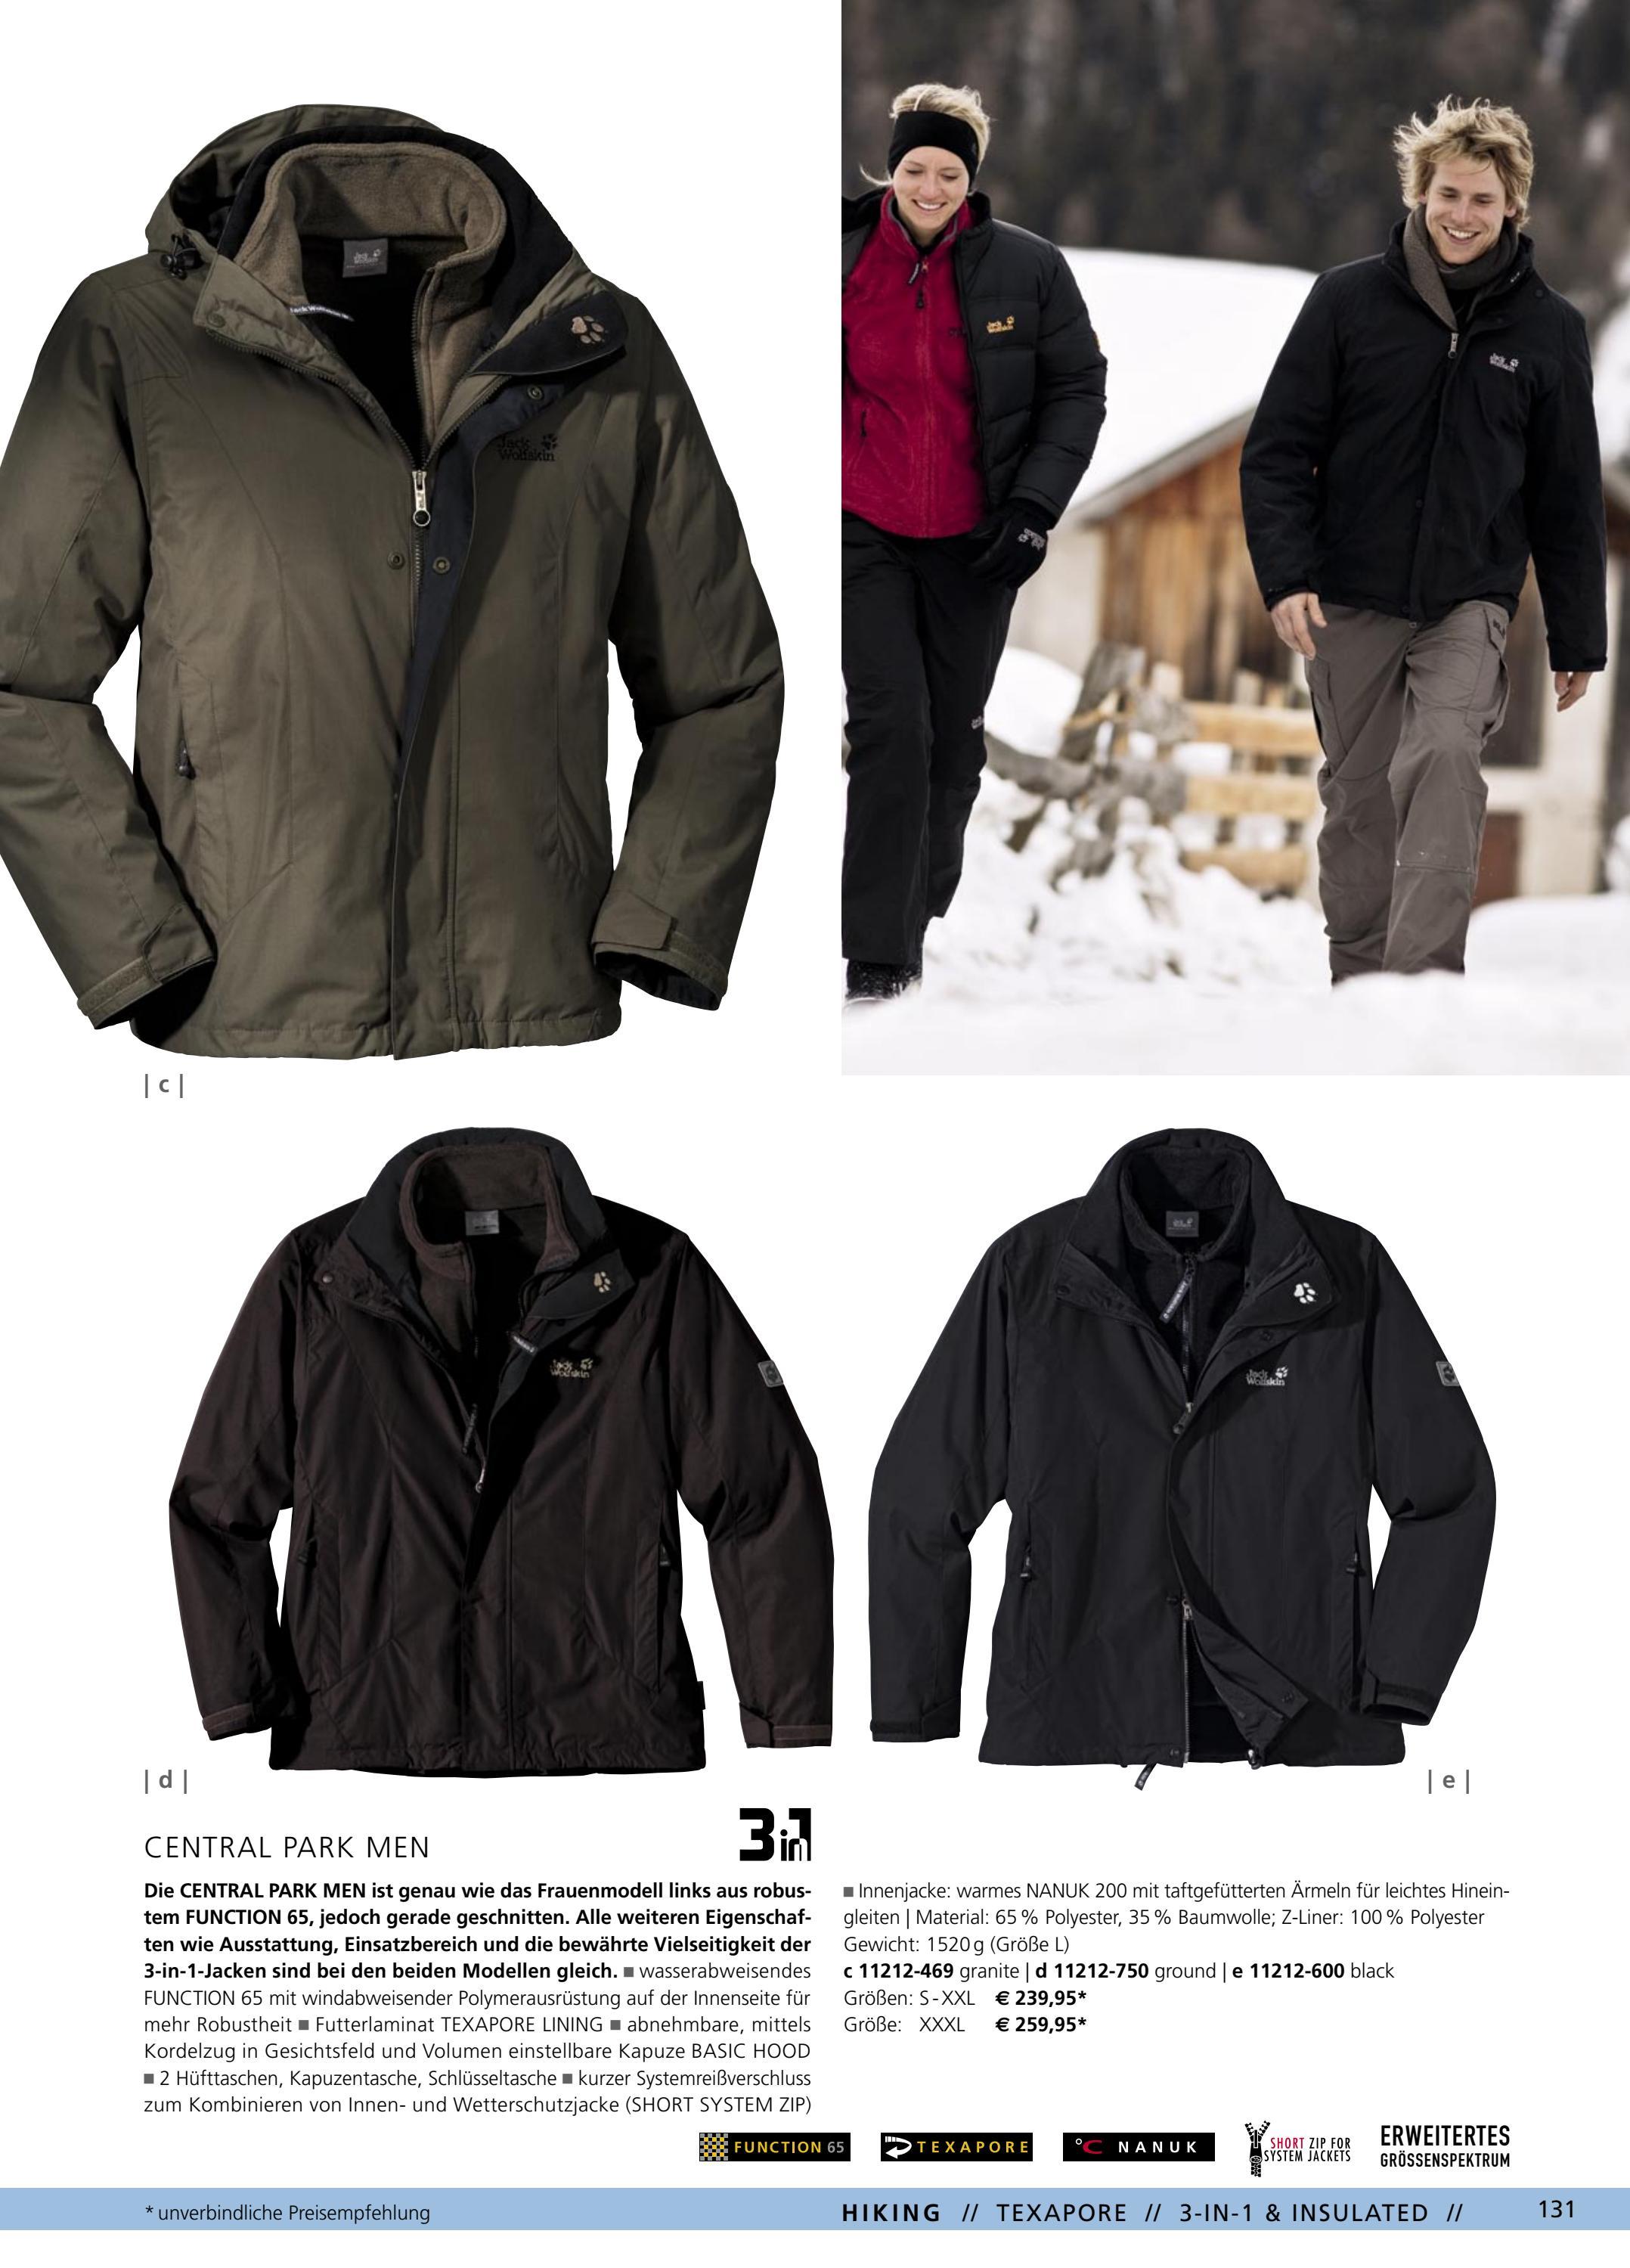 Jack Wolfskin Winter Jacke 3 in 1 Größe 3xl